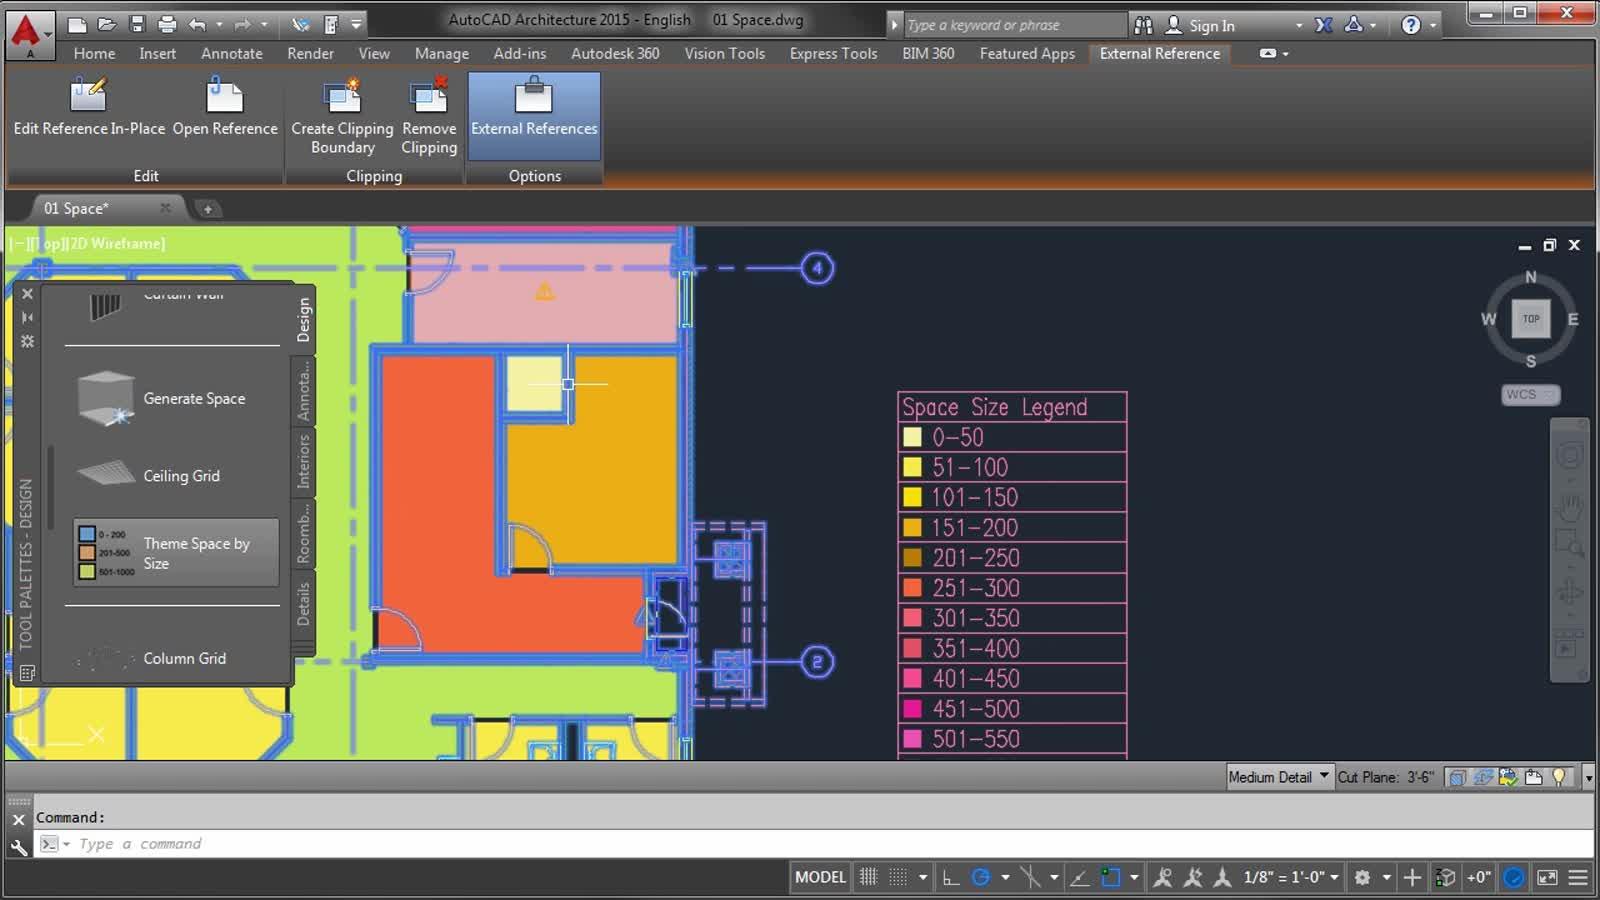 Oem Autodesk Autocad Architecture 2014